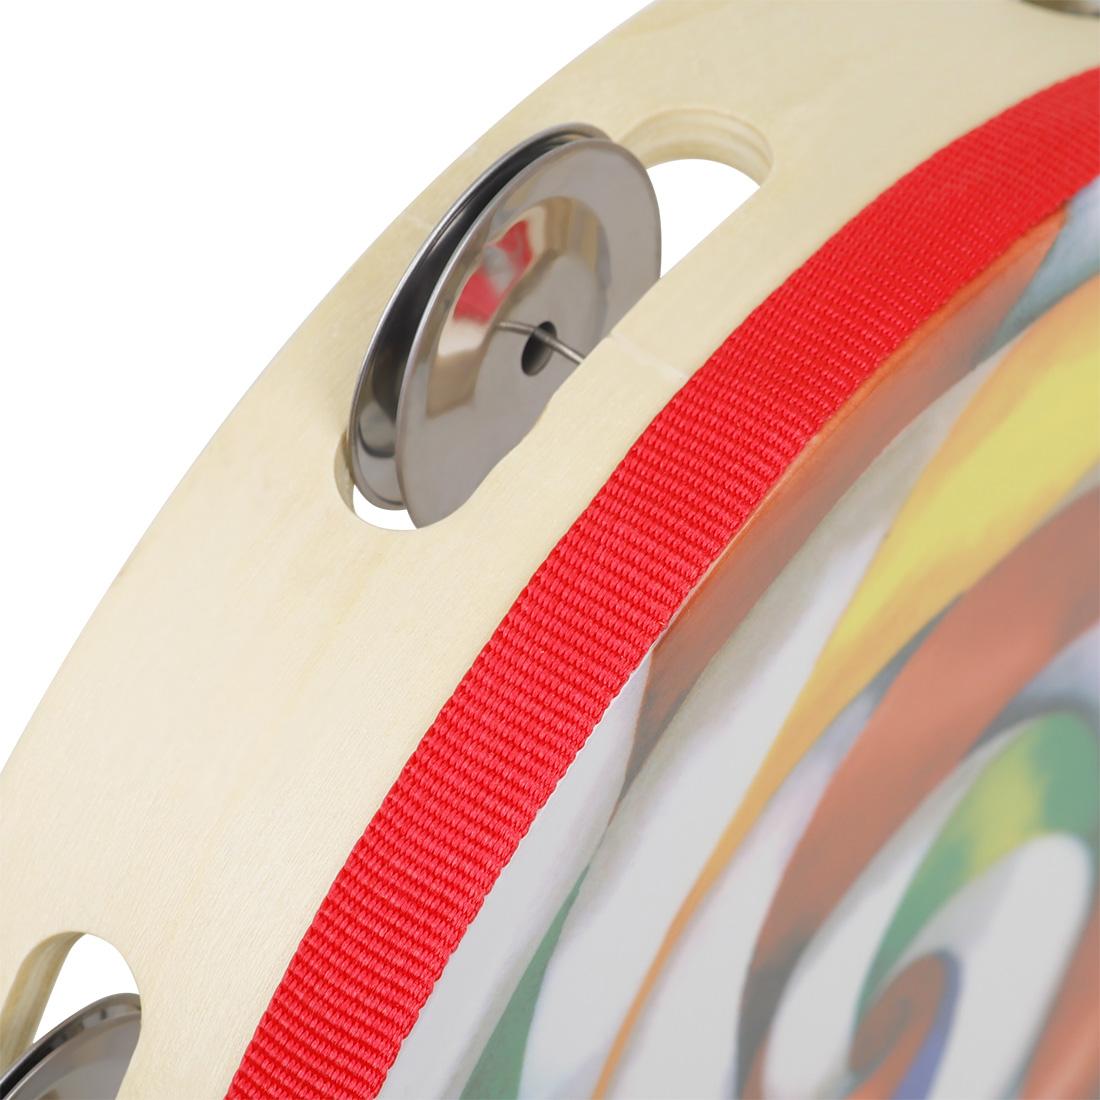 DT-64 8 Inch Lollipop Single Row Hand Tambourine Orff Musical Instrument